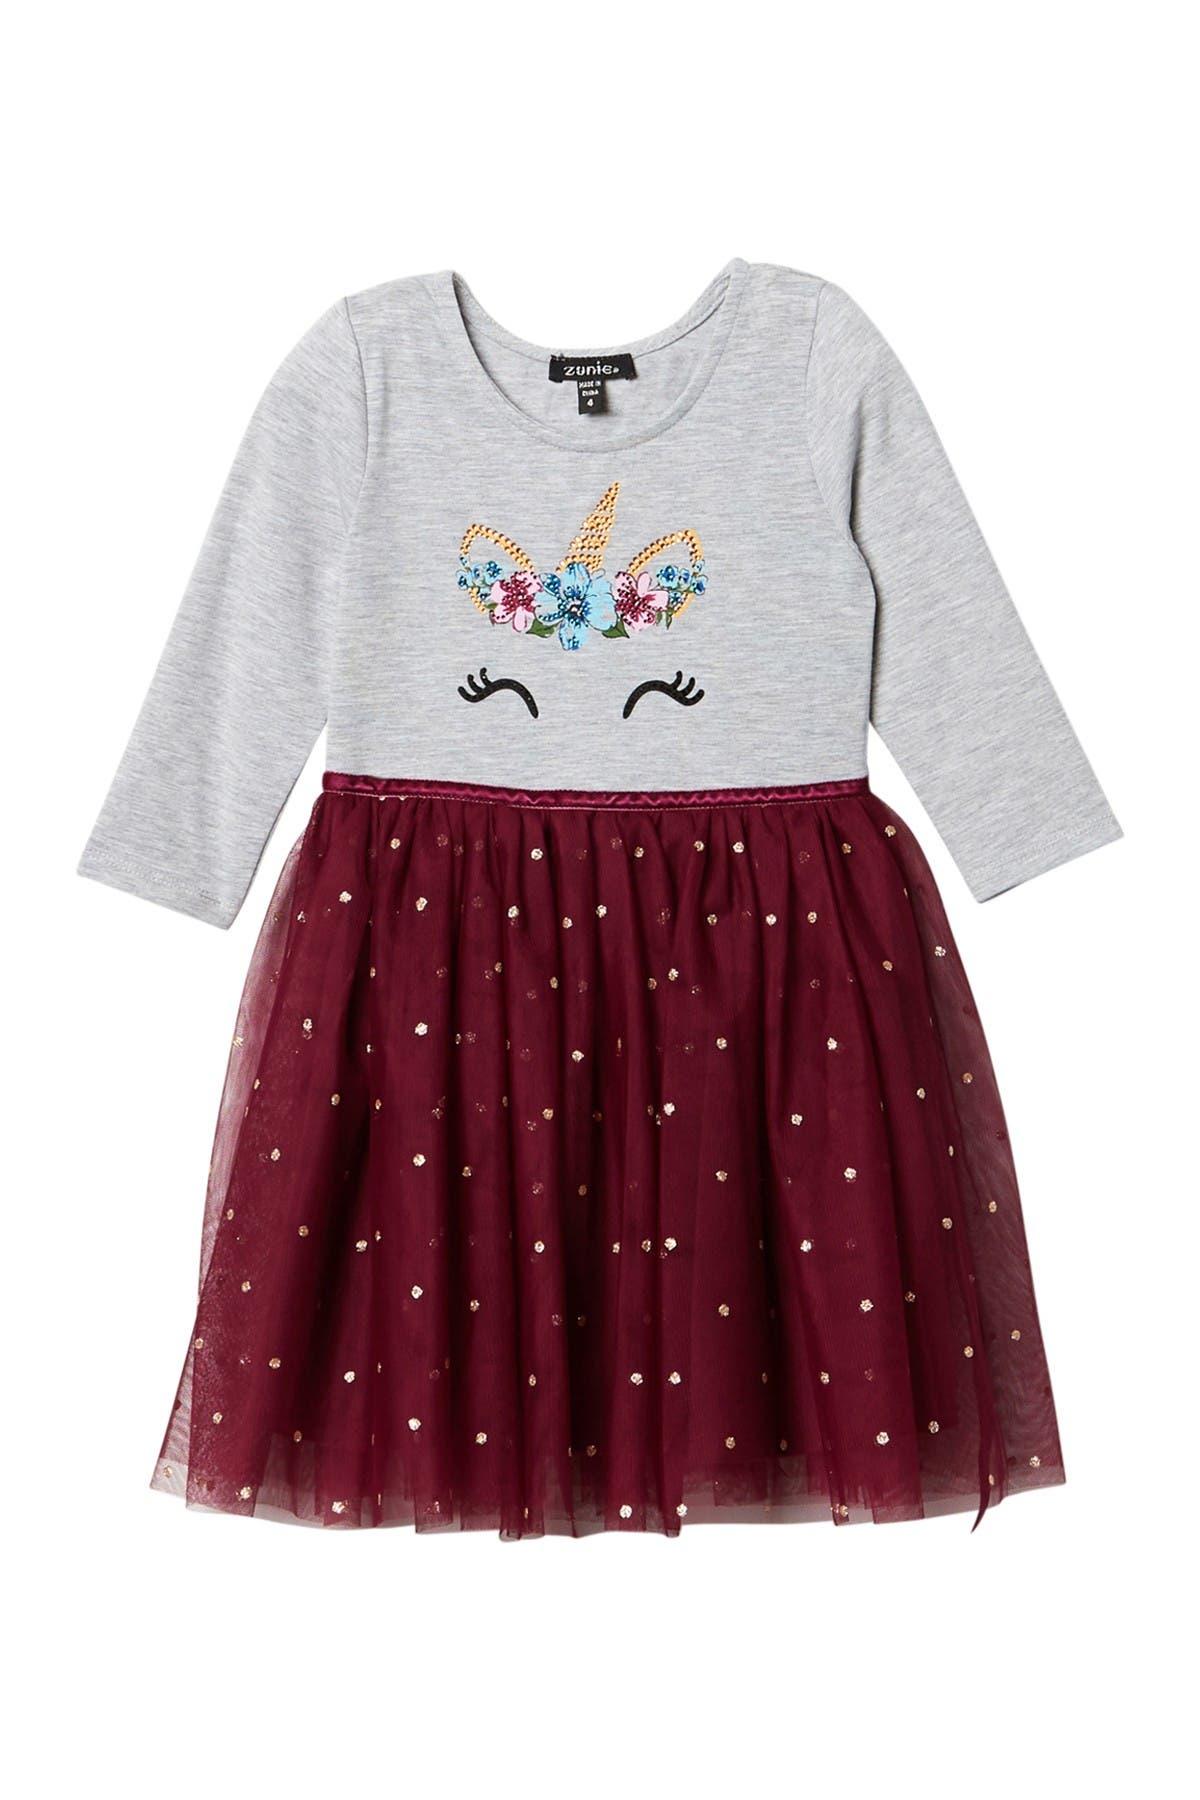 Image of Zunie 3/4 Sleeve Glitter Skirt Unicorn Dress